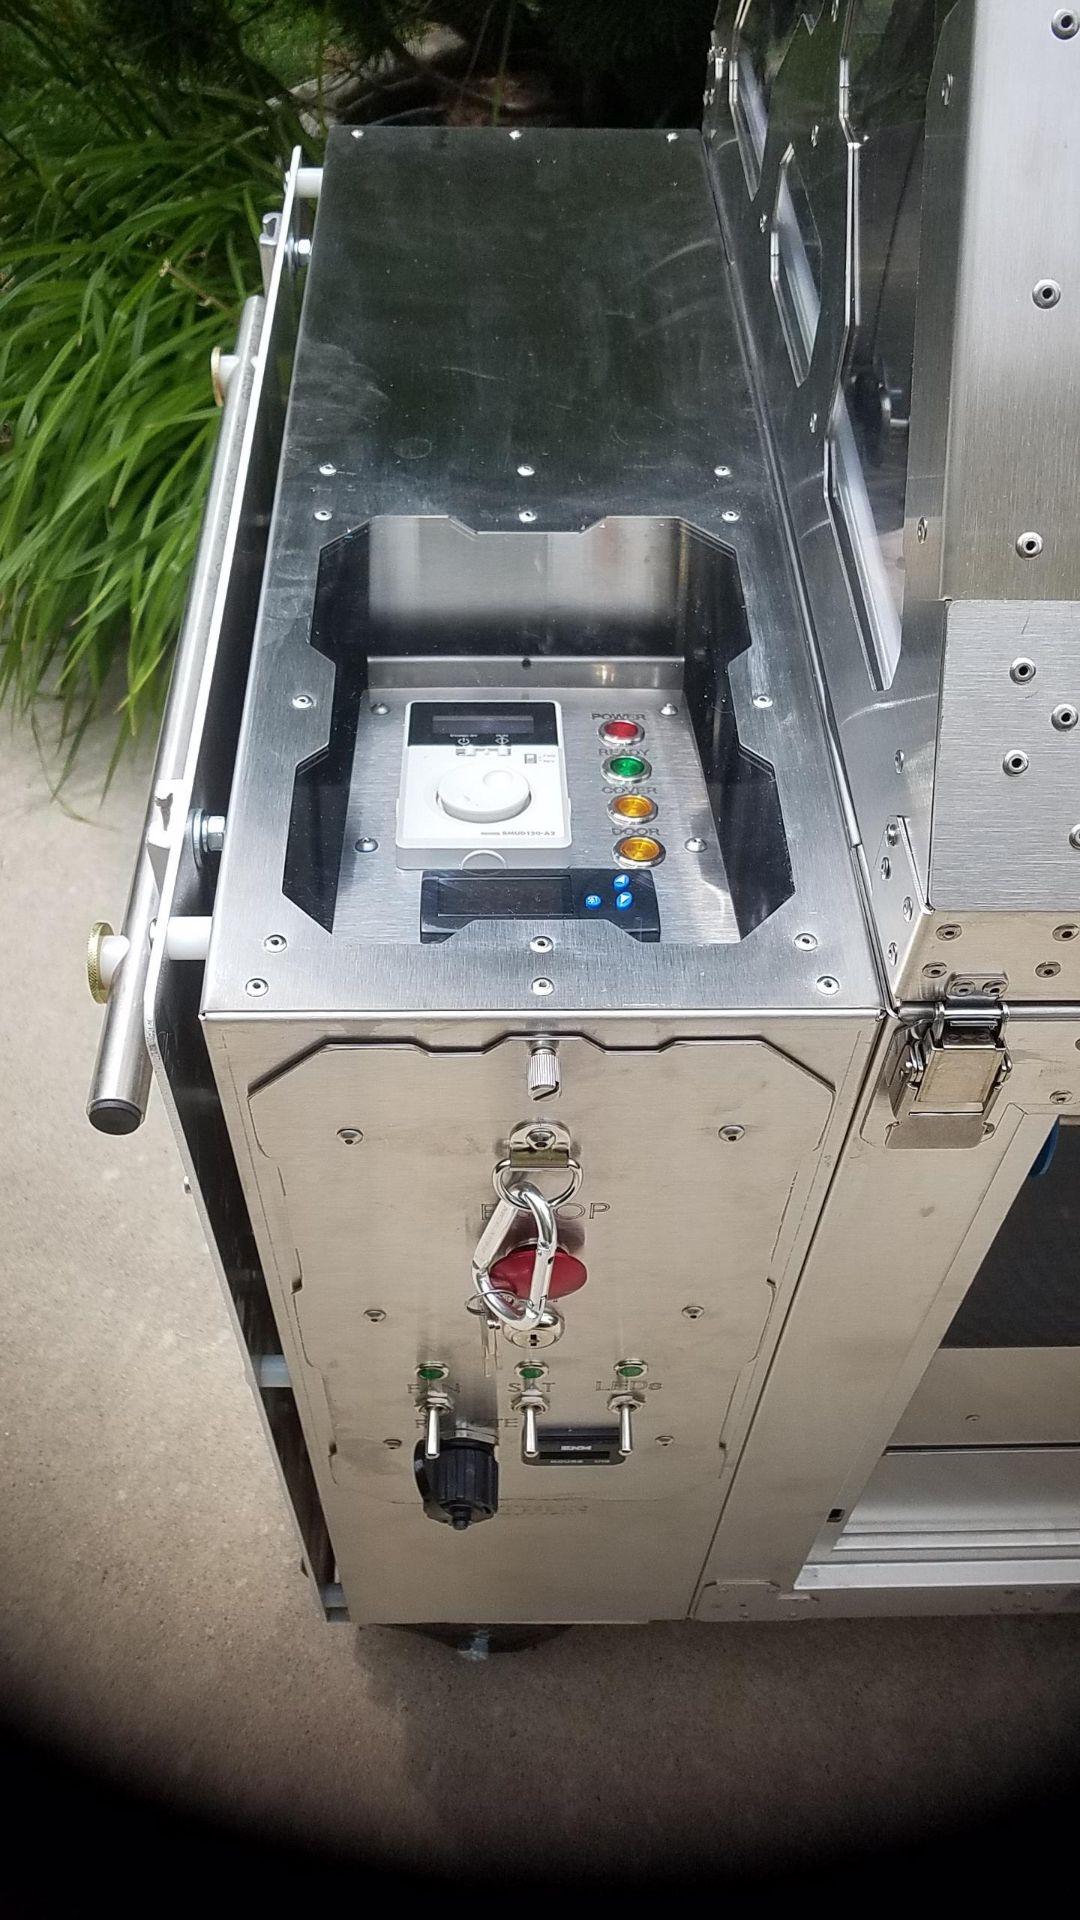 Unused/FactoryNew Revolution Cannabis & Hemp Flower Finisher System Model RDF 4300.100-200 lbs/8 hrs - Image 20 of 32